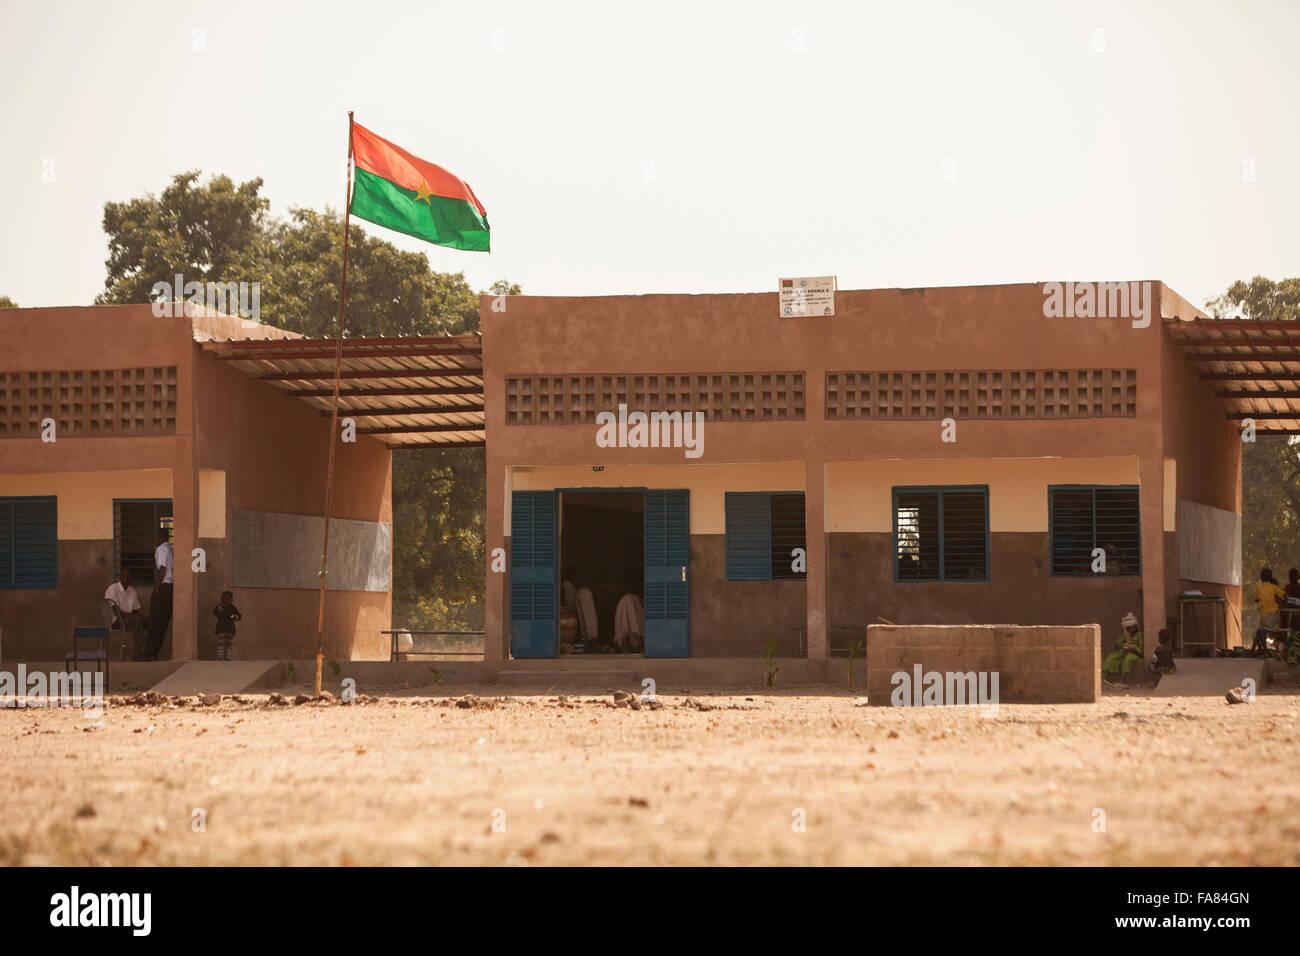 Students learn at Kouka Primary School in Kouka Department, Burkina Faso. - Stock Image